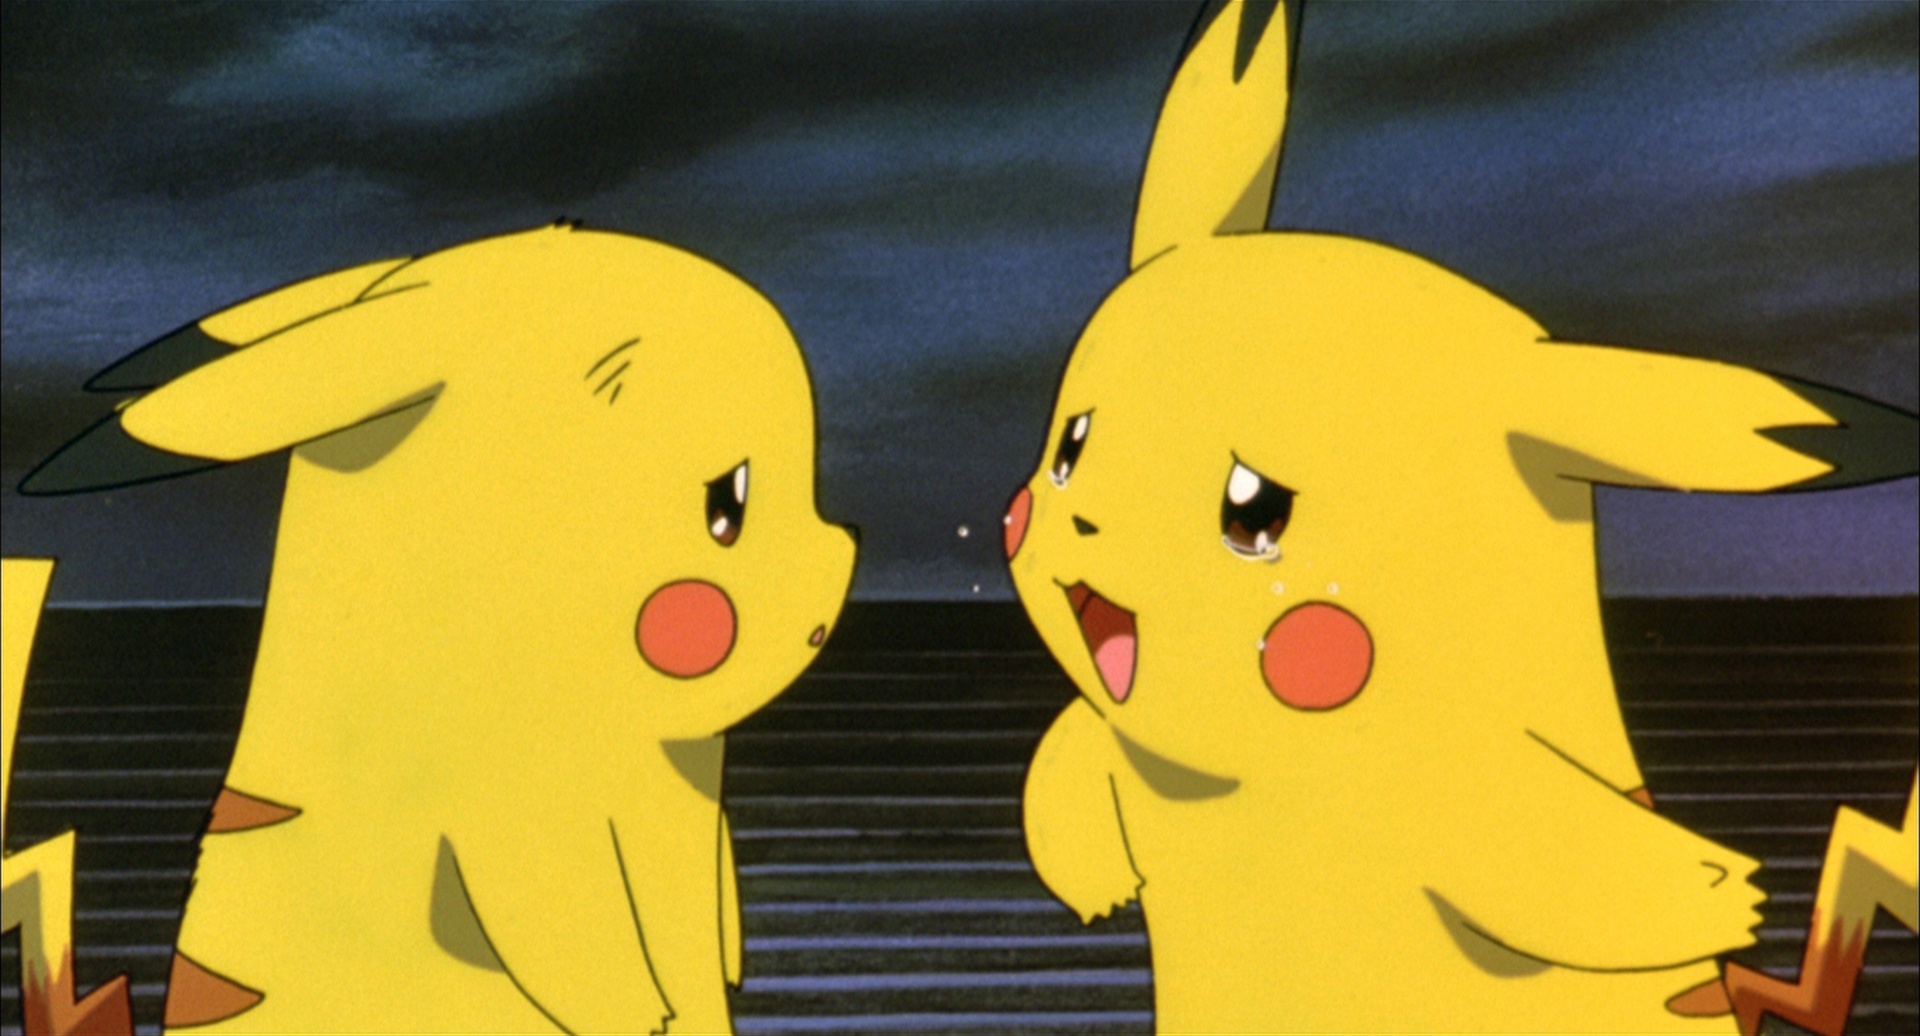 (C)Nintendo・Creatures・GAME FREAK・TV Tokyo・ShoPro・JR Kikaku (C)Pokémon (C)1998 ピカチュウプロジェクト